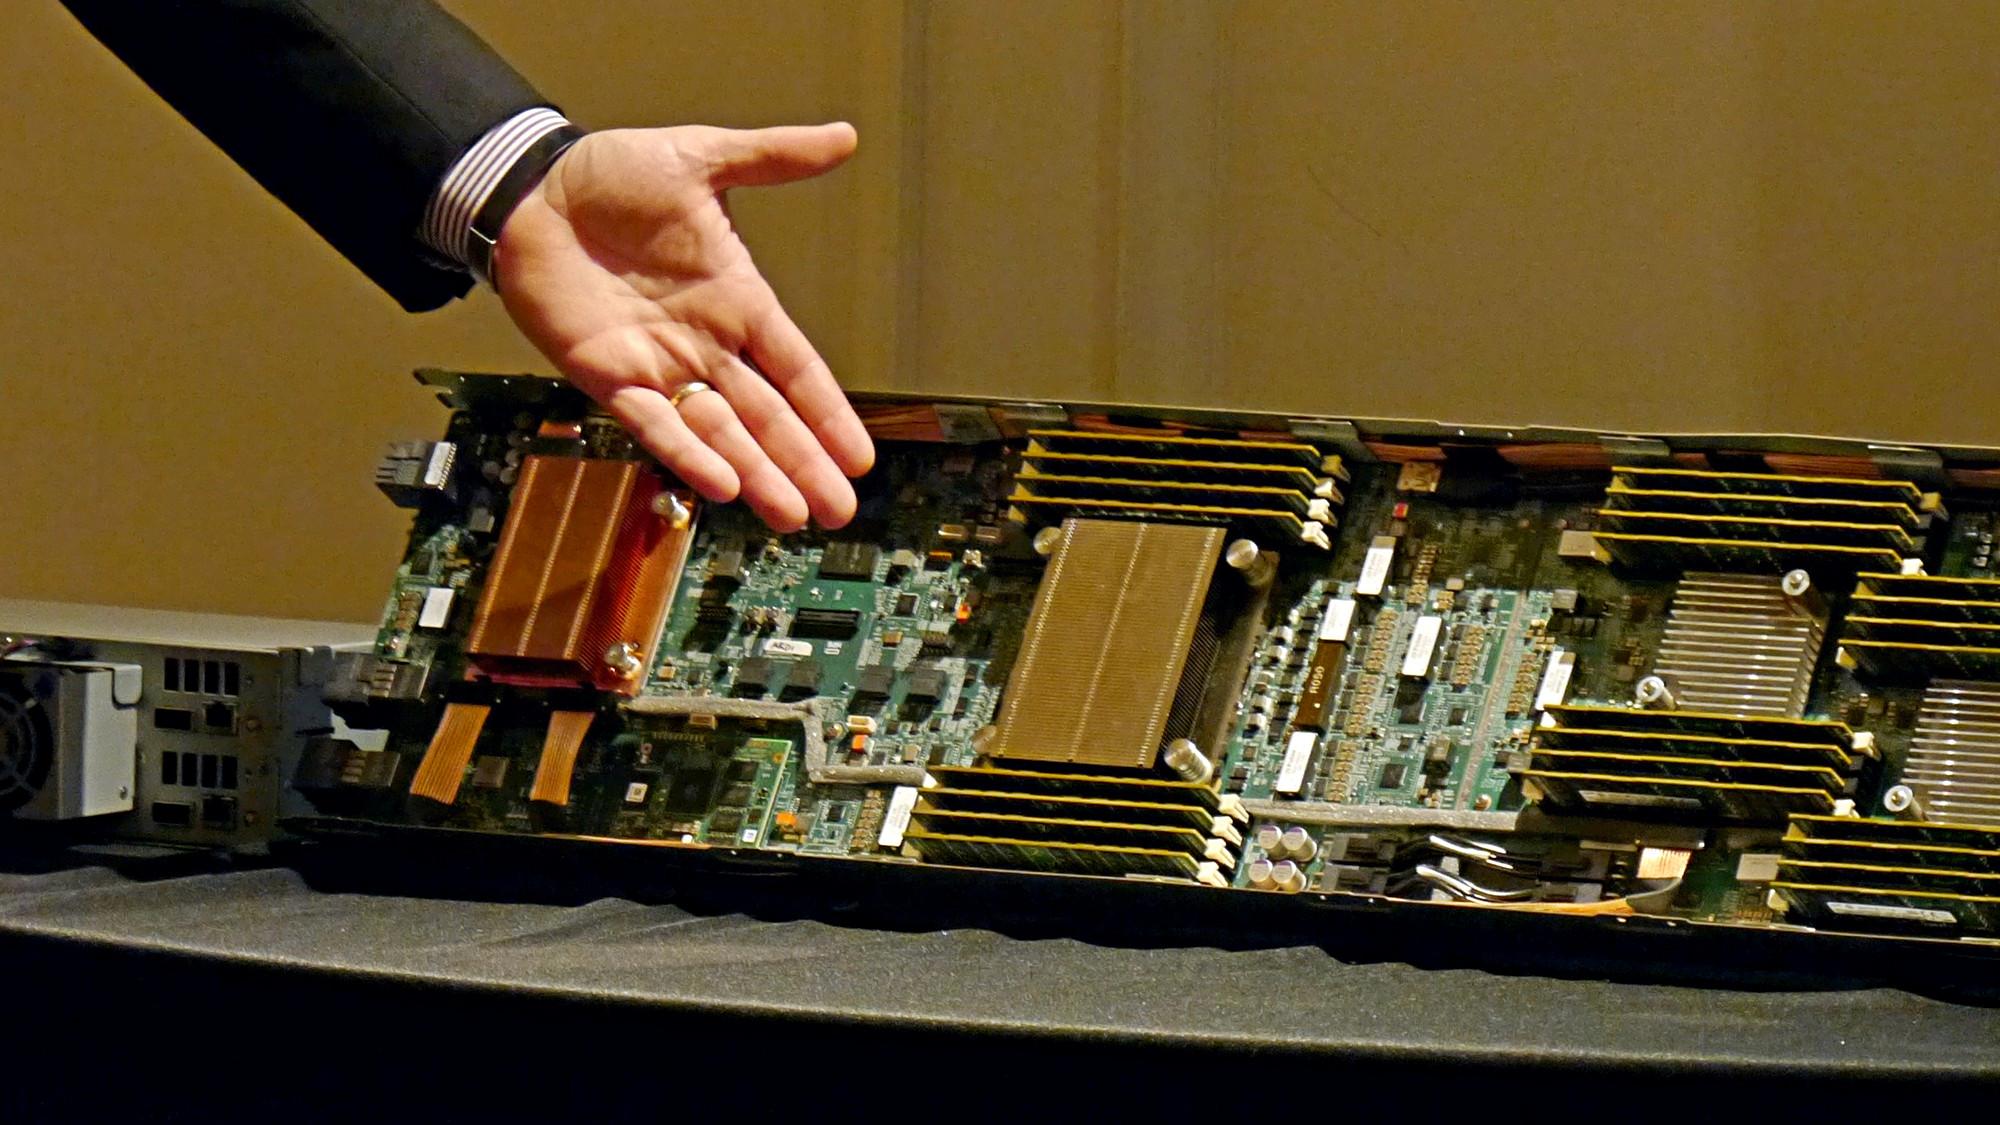 Memory-Driven Computing: HPE zeigt Prototyp von The Machine - HPE zeigt The Machine. (Foto: Marc Sauter/Golem.de)